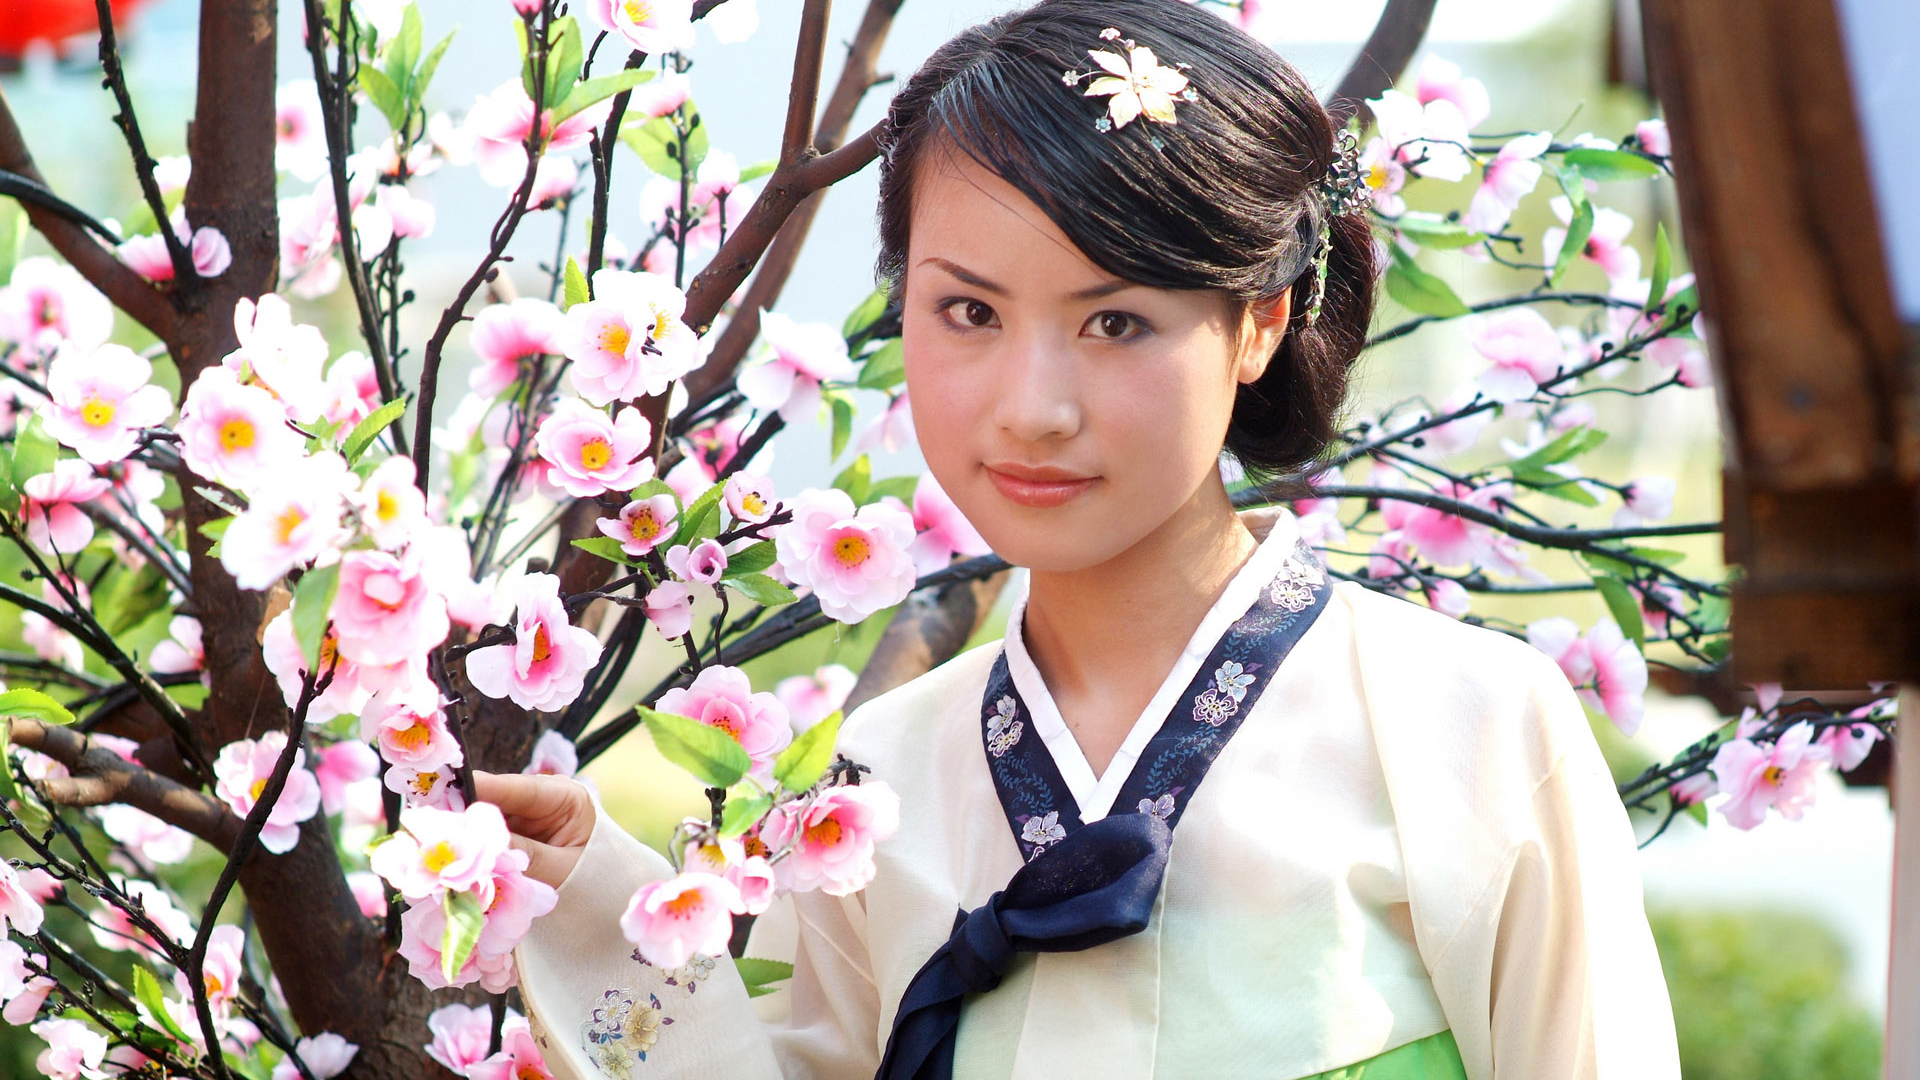 Free Download Asian Girls Wallpaper People 1920x1200 1920x1200